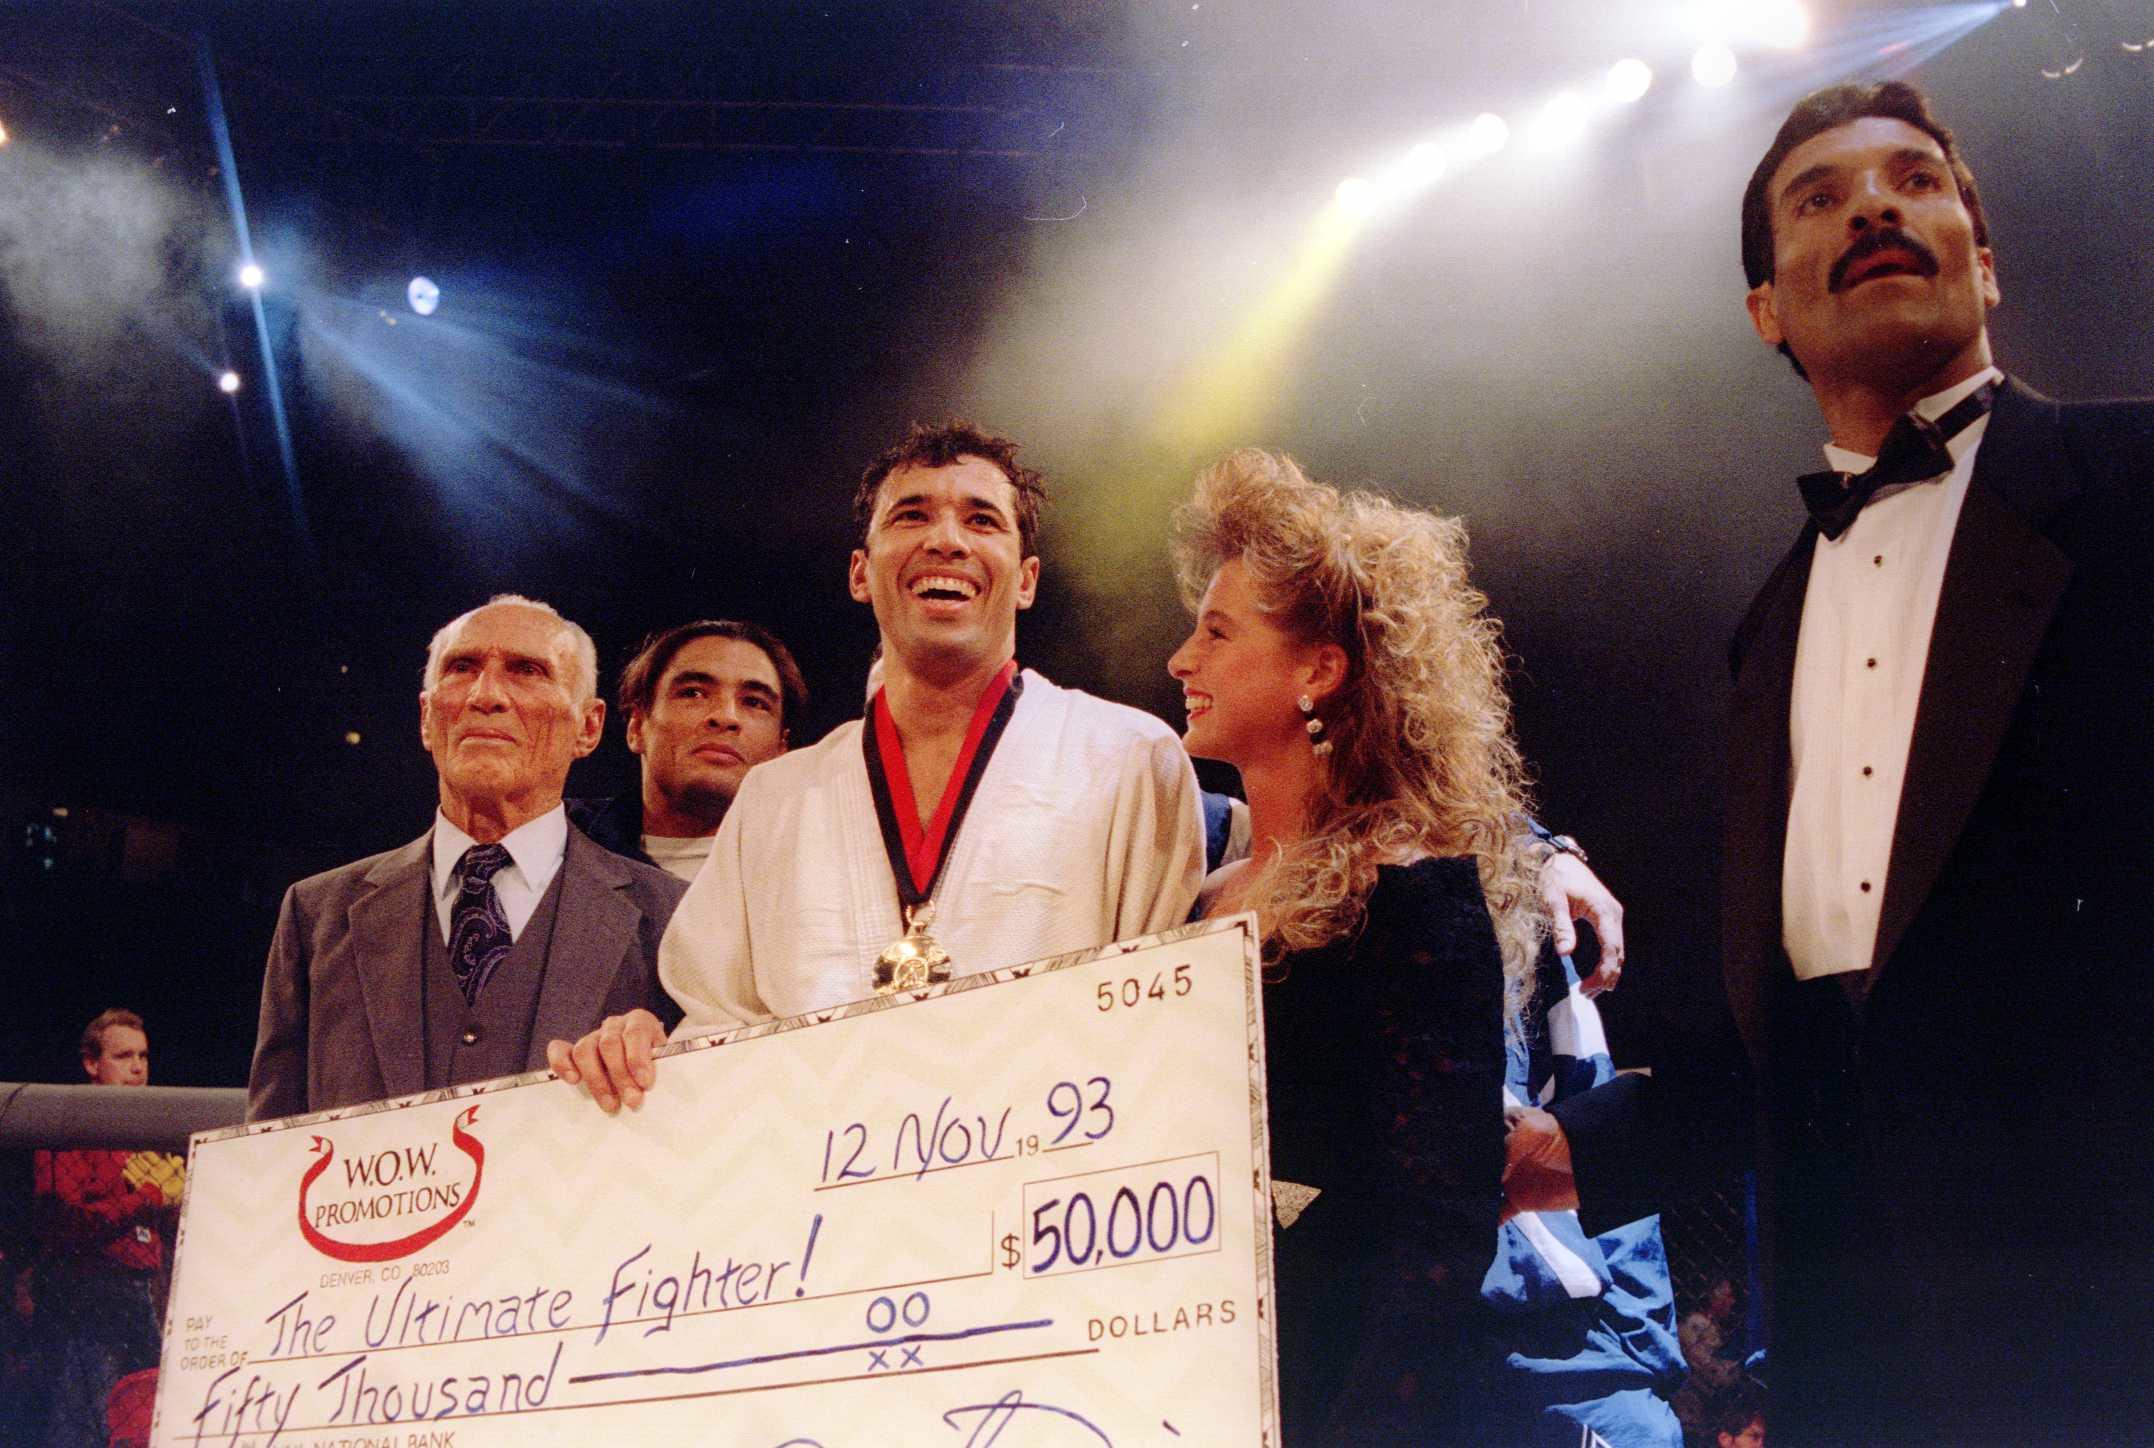 Royce Gracie recibe cheque de primer UFC  Markus Boesch. De Iesquiera a derecha. Helio Gracie, Rickson, Royce, y Rorion Gracie. Foto via  Markus Boesch